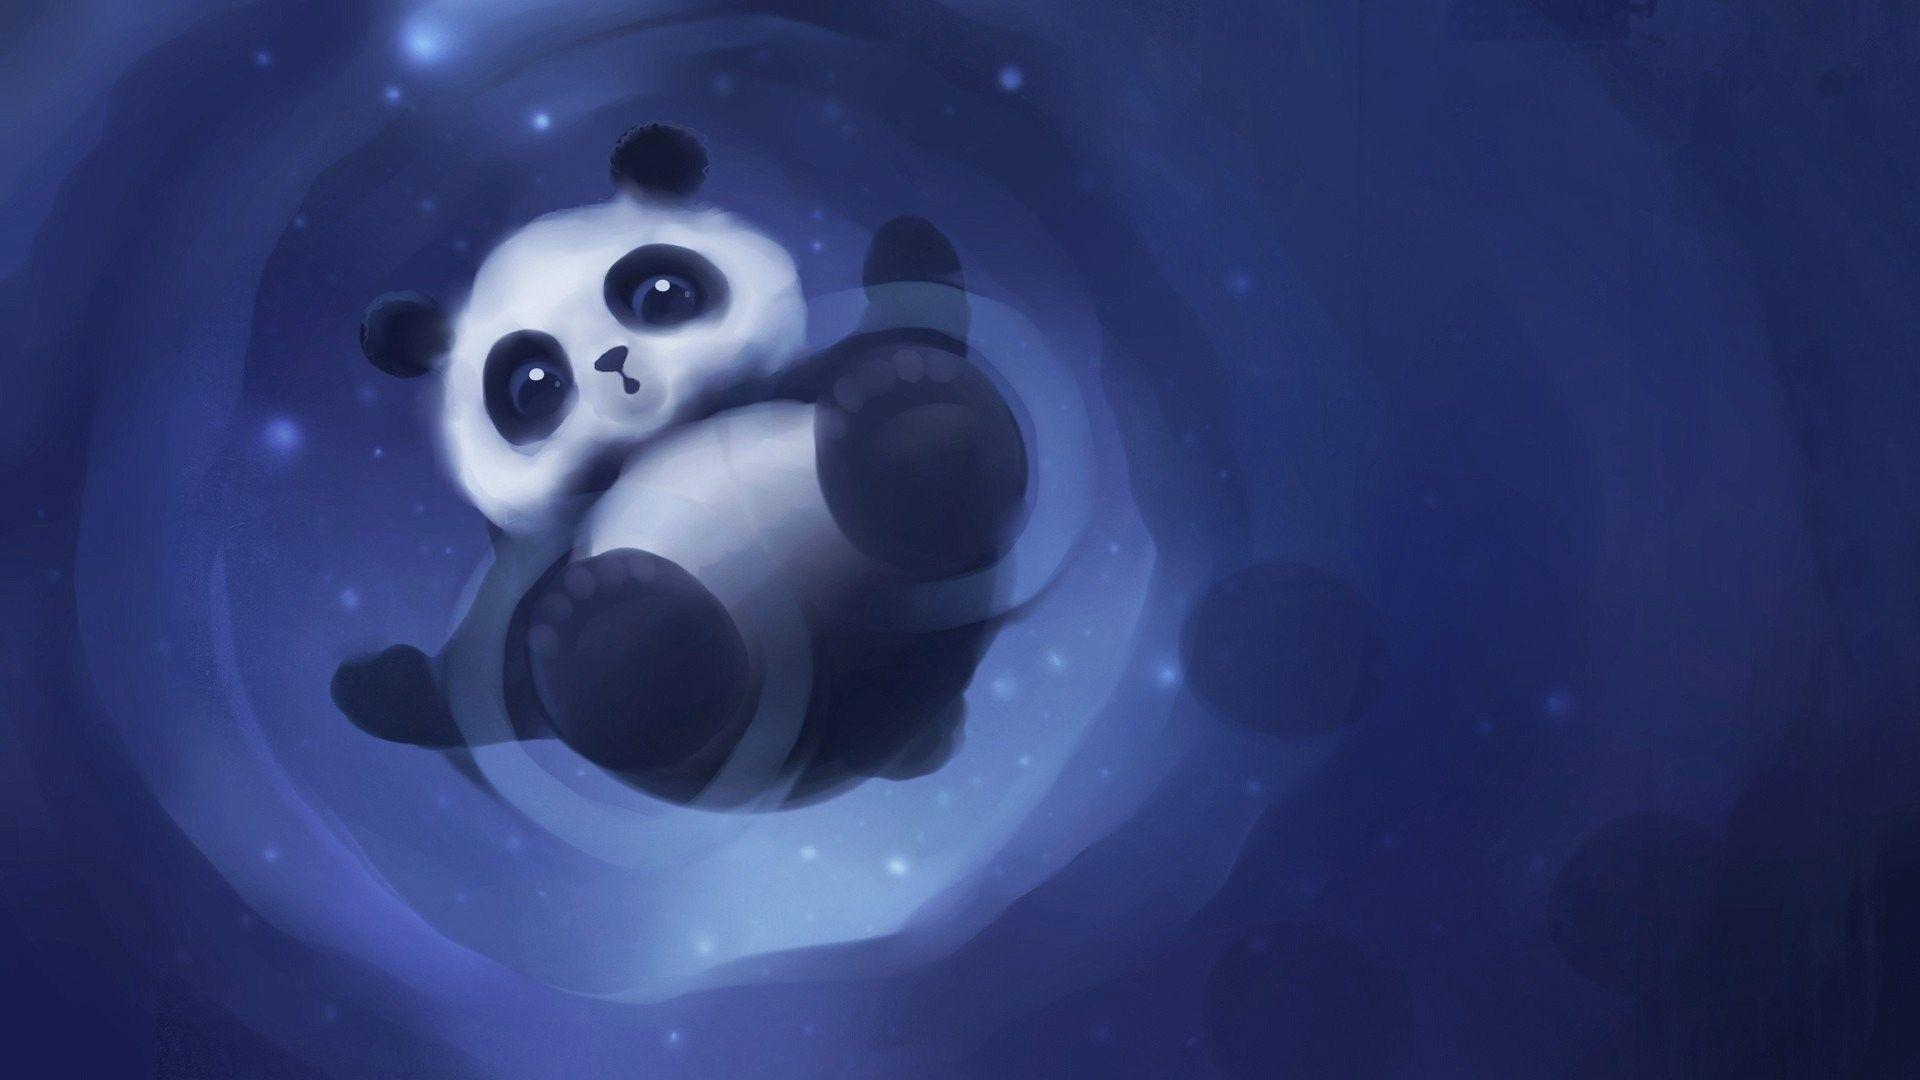 Cute Pandas Wallpapers Wallpaper Cave